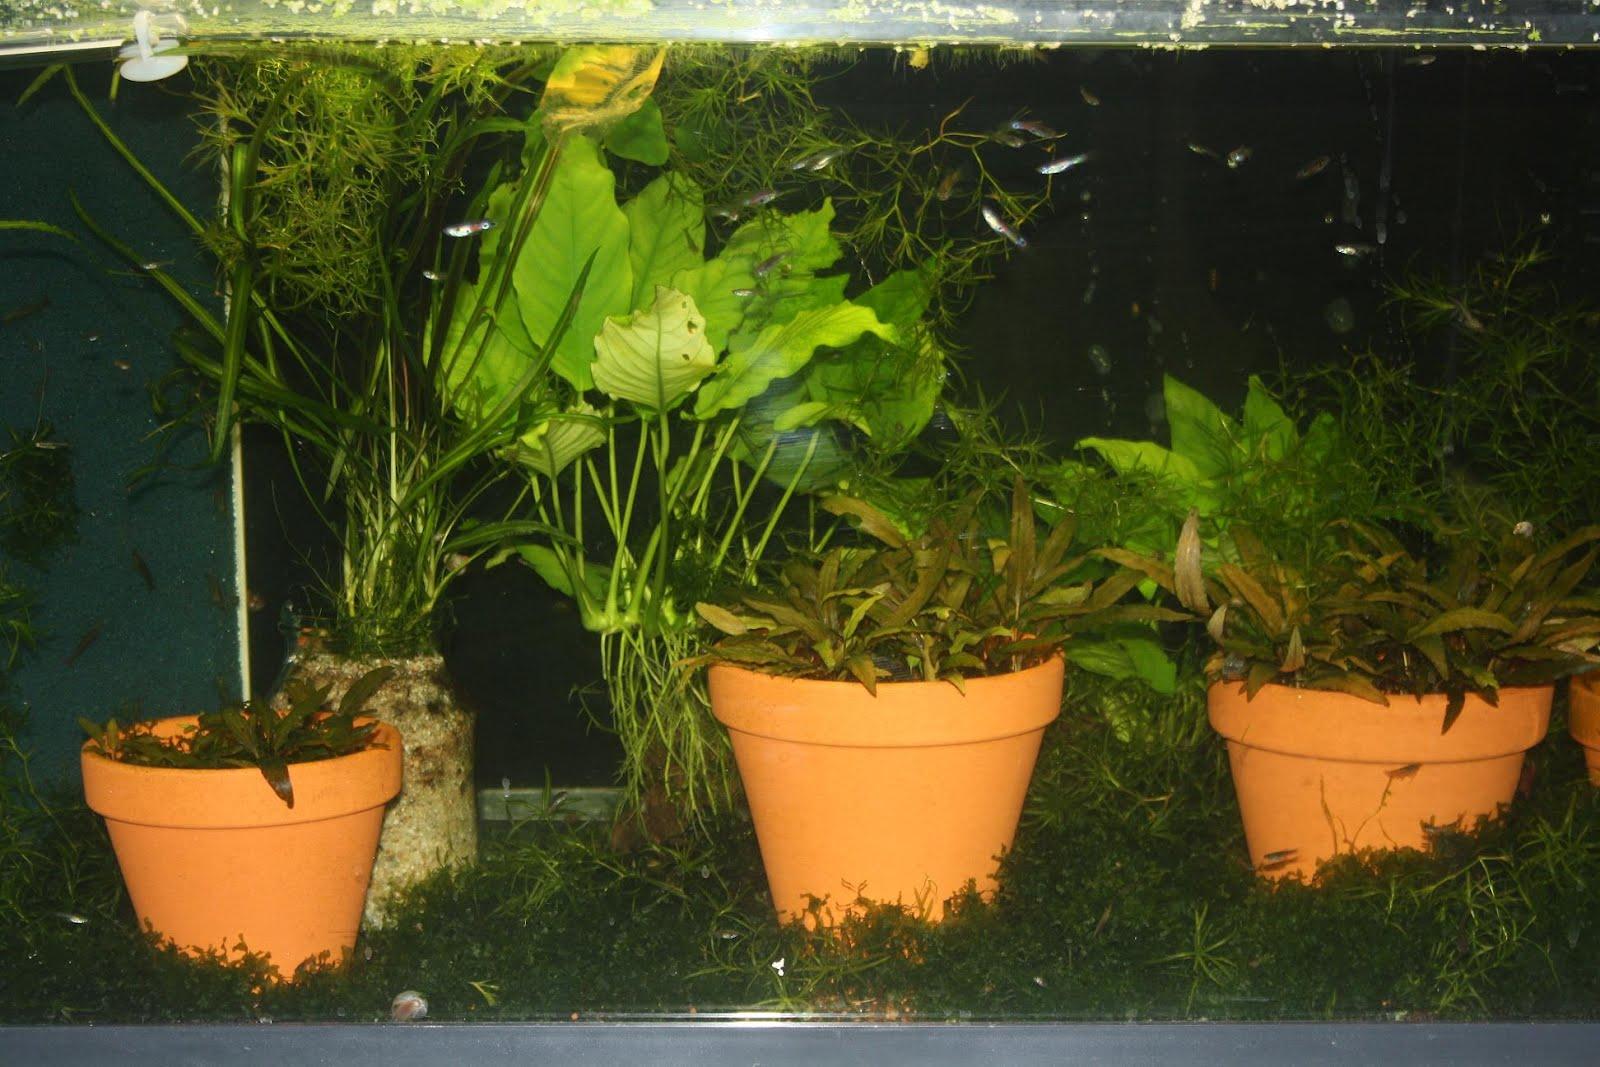 http://2.bp.blogspot.com/-j7qJyM-IPIM/T7p_R5j-apI/AAAAAAAABFY/Wu-qJYIZNwg/s1600/Tobago.JPG